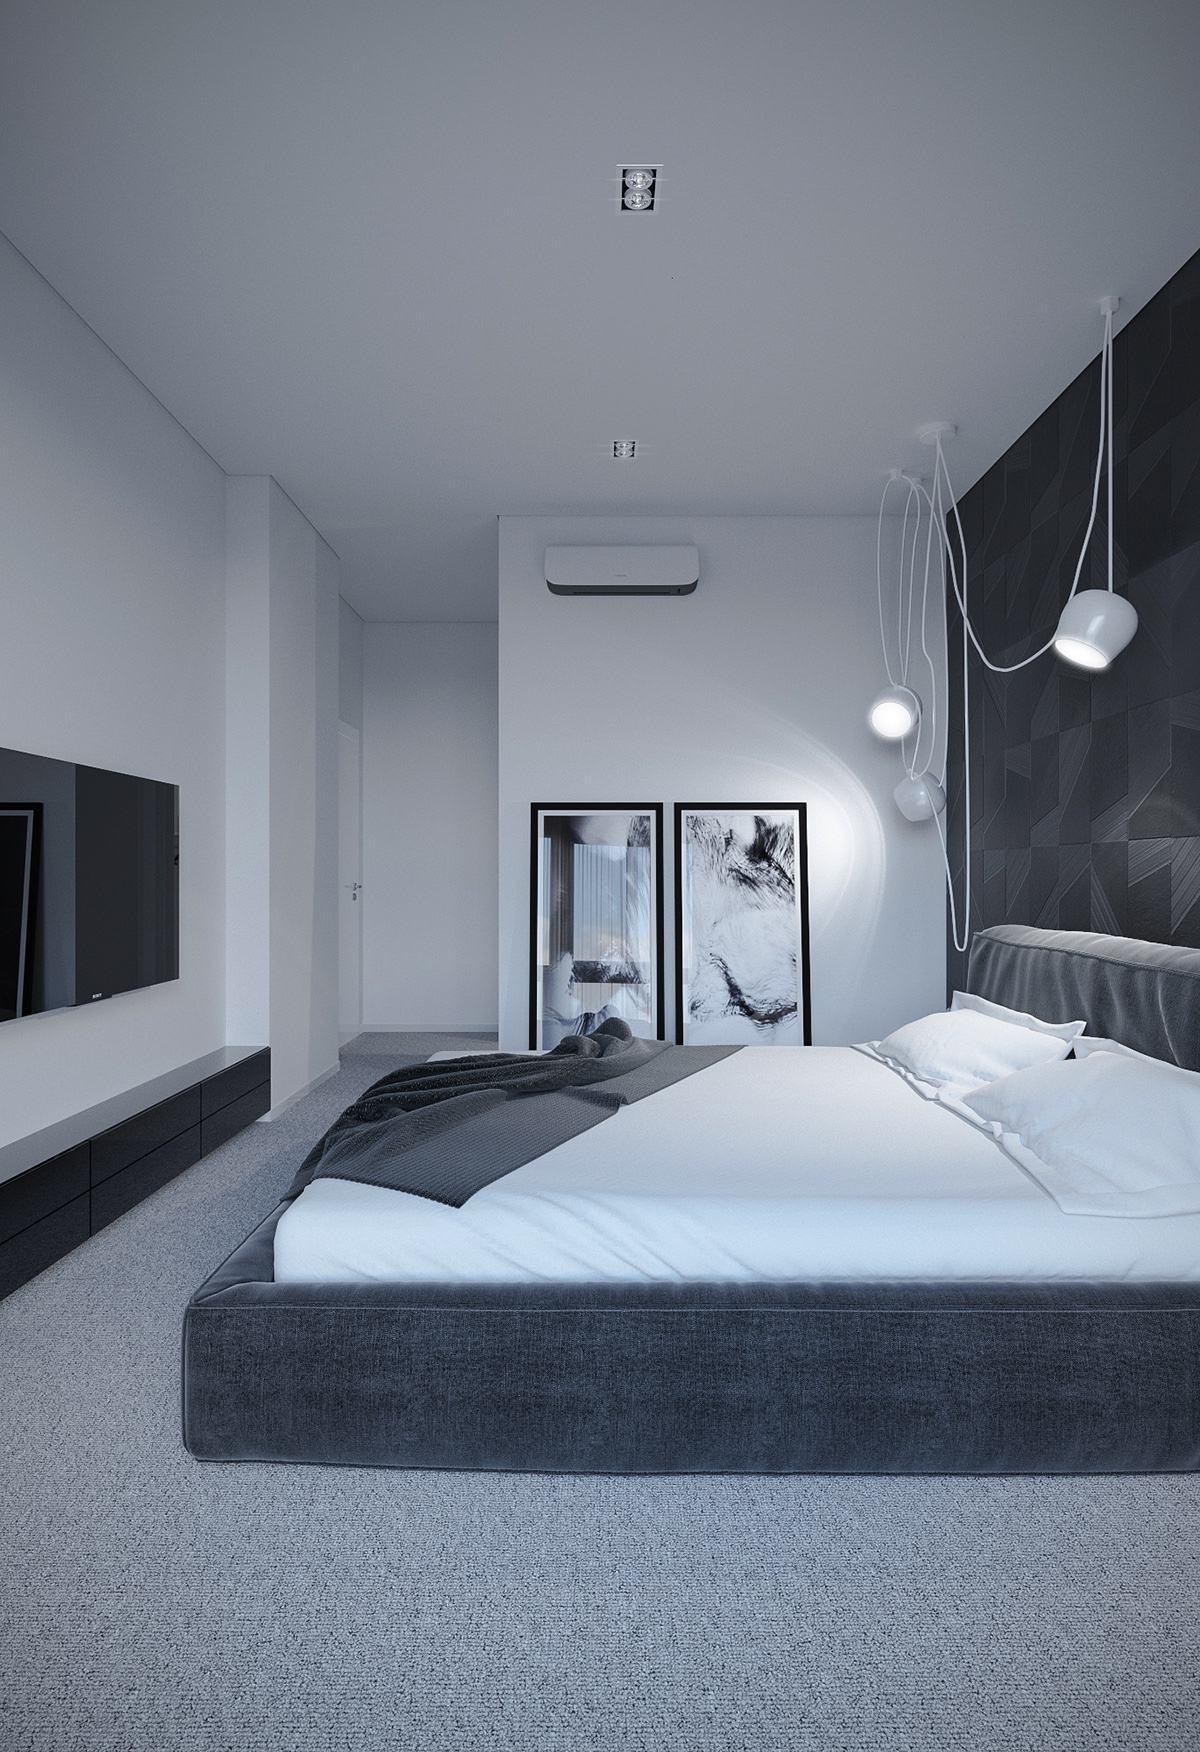 . 6 Dark Bedrooms Designs To Inspire Sweet Dreams